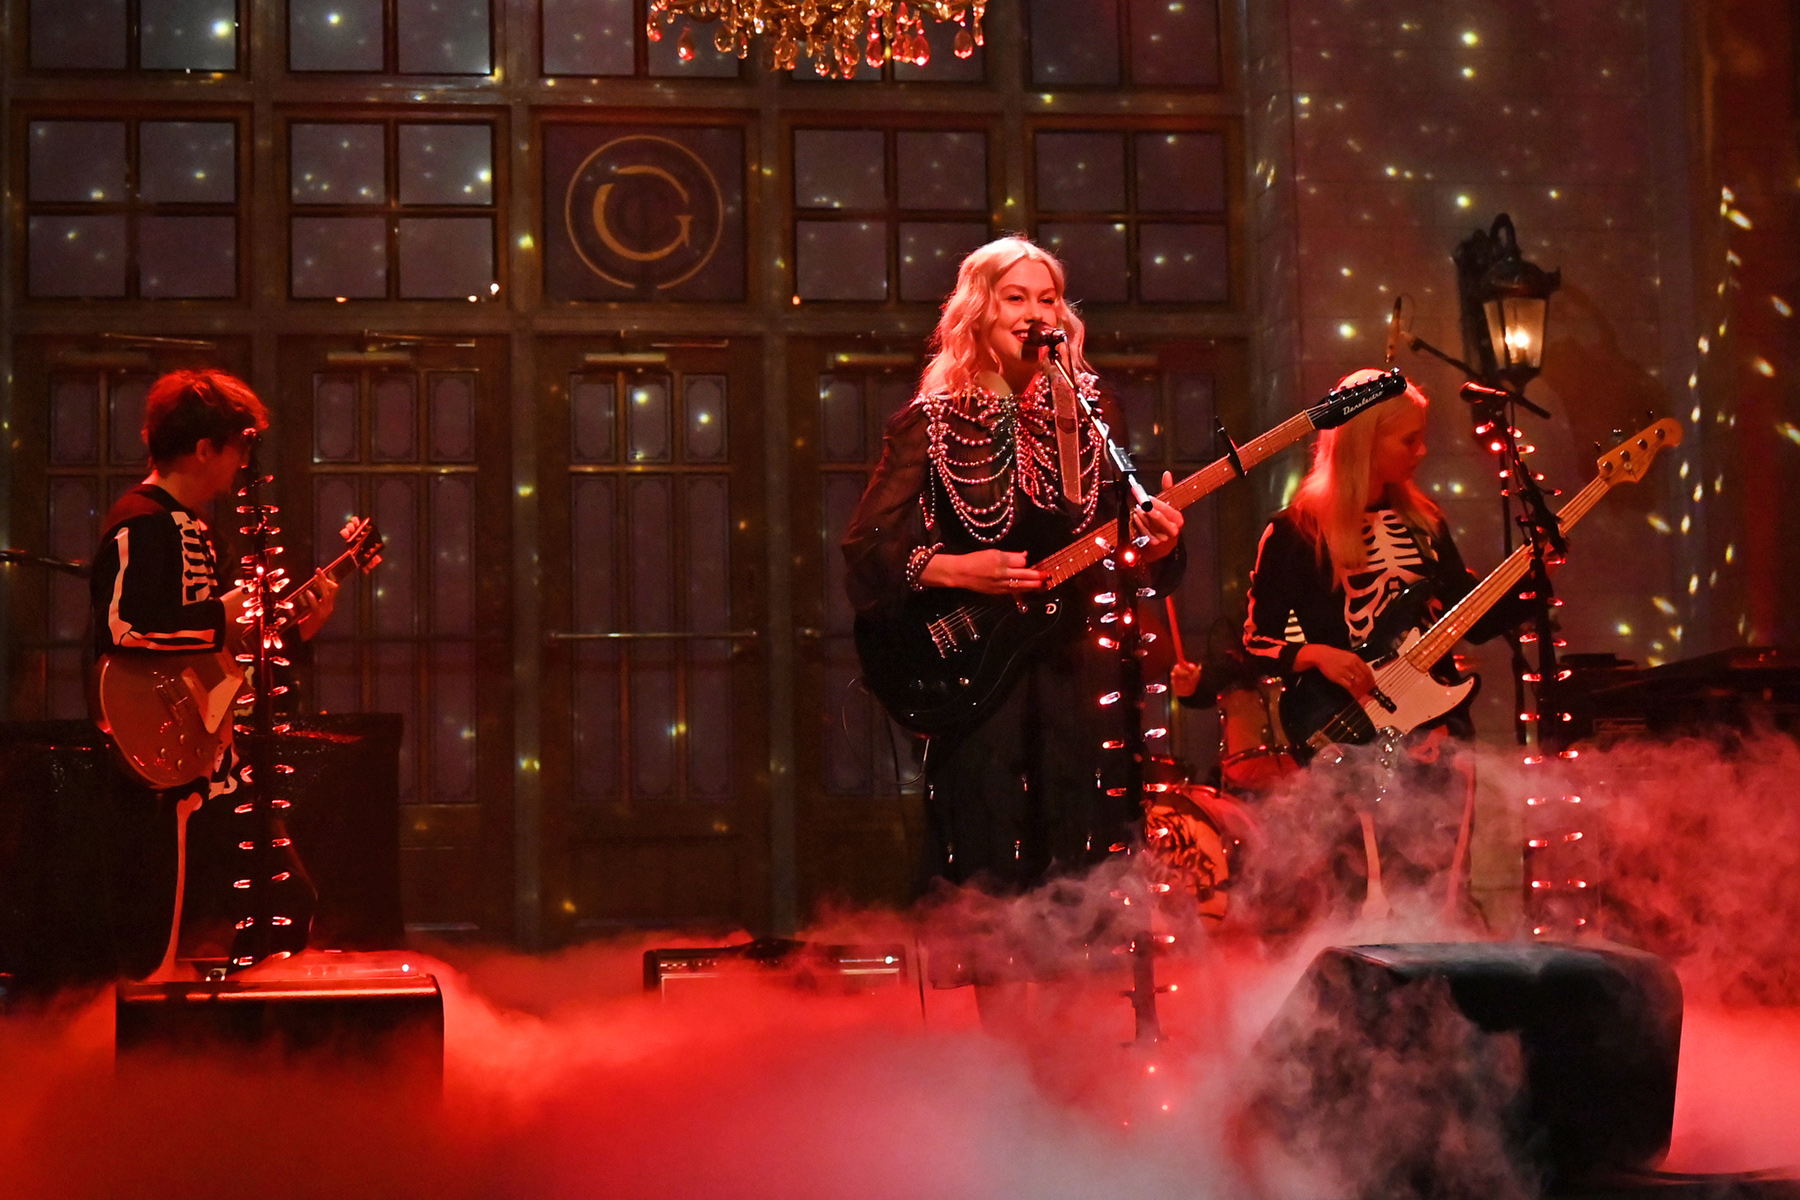 Phoebe Bridgers on 'SNL': Yes, It's OK for Women to Smash Guitars - Rolling Stone